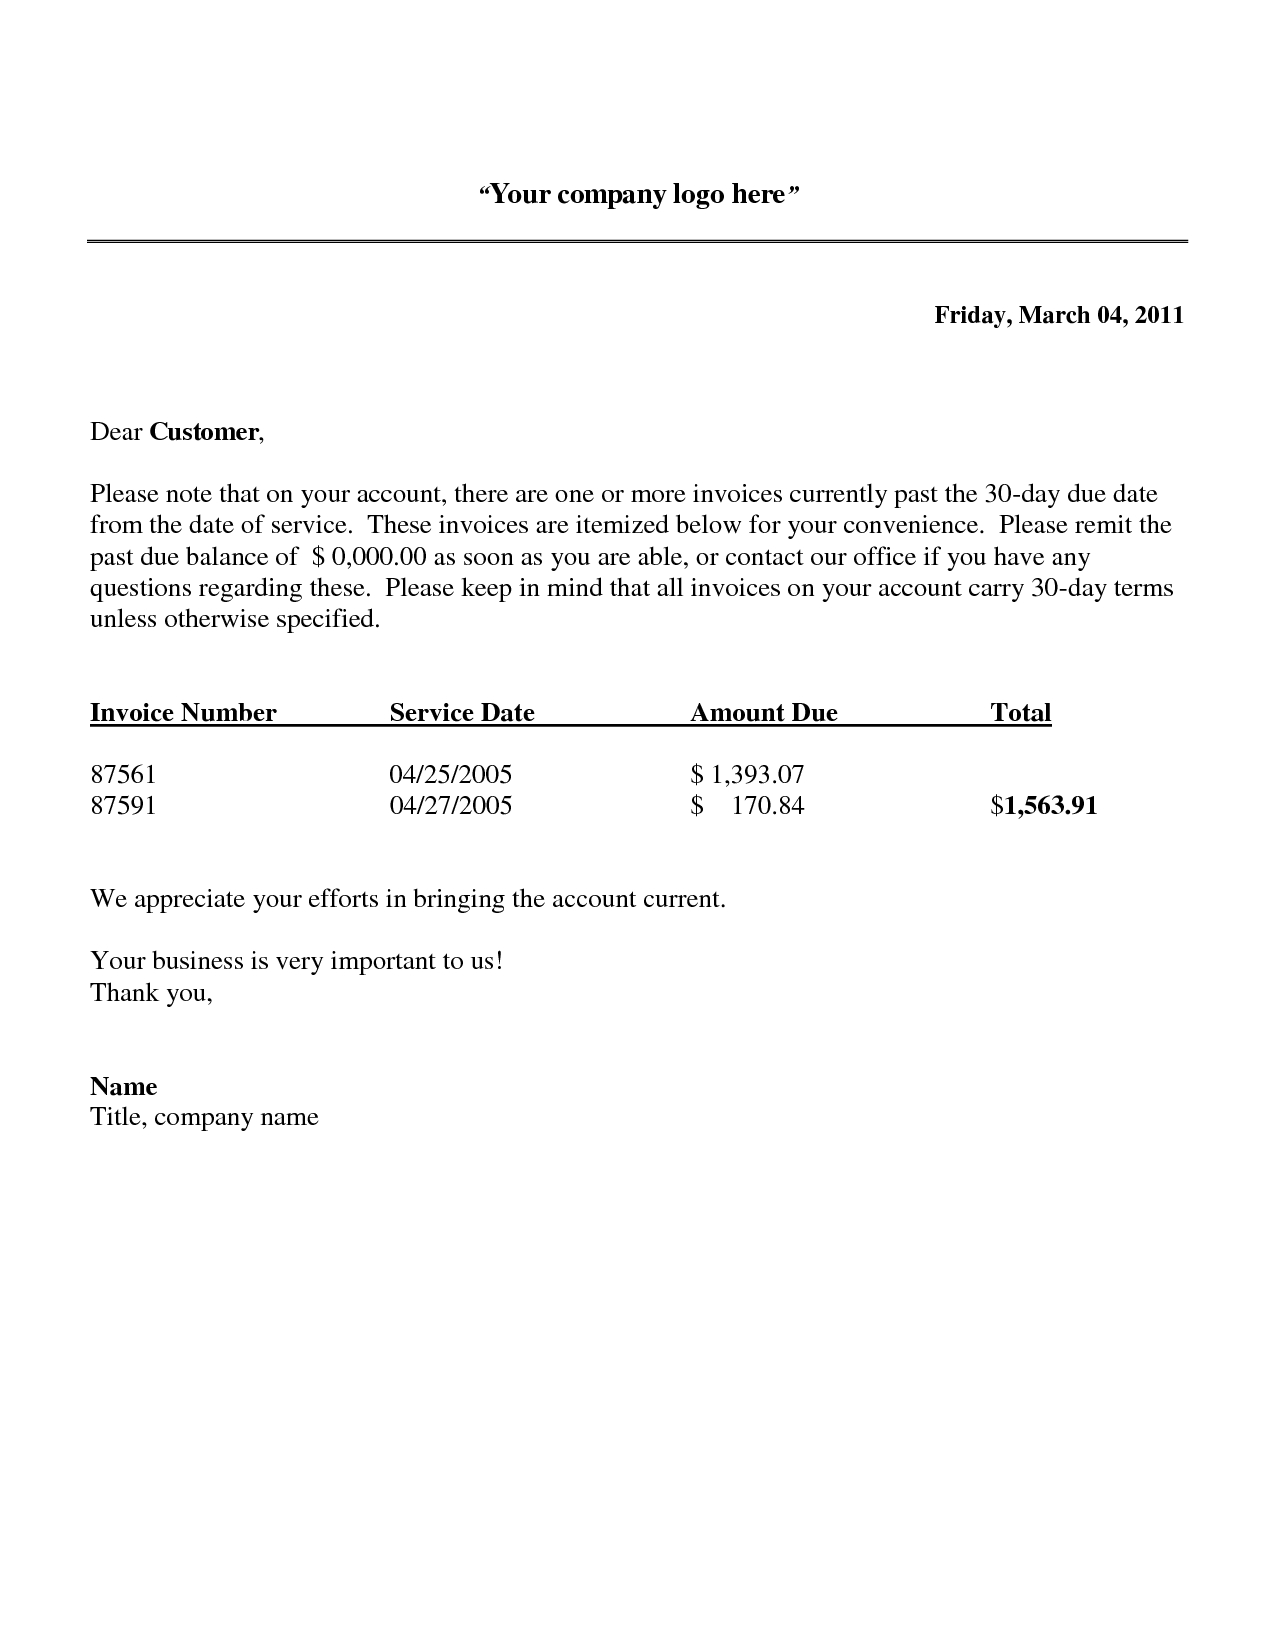 e mail letter standard business letter format sample past due sample letter for past due invoices